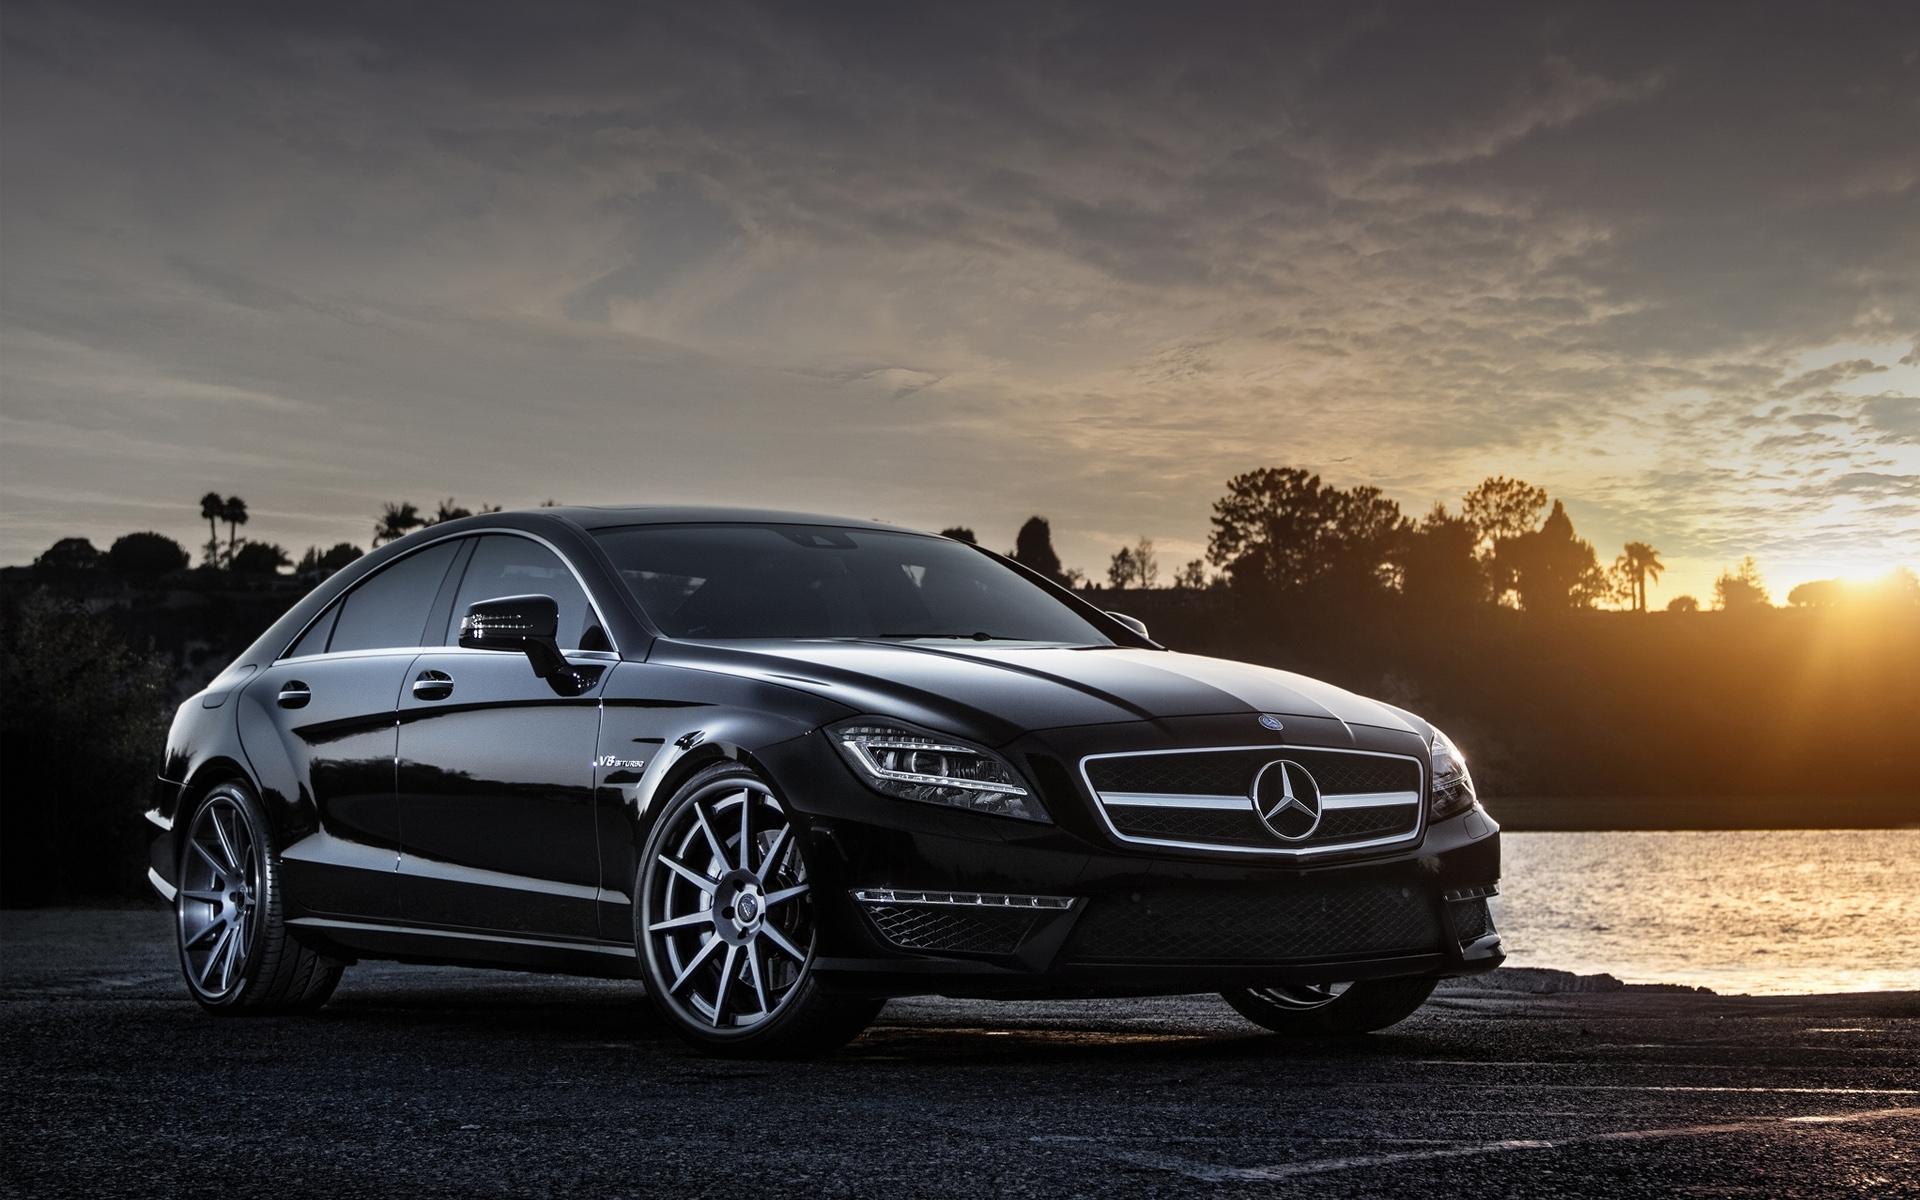 10 New Mercedes Benz Wallpaper Hd Full Hd 1080p For Pc Desktop 2019